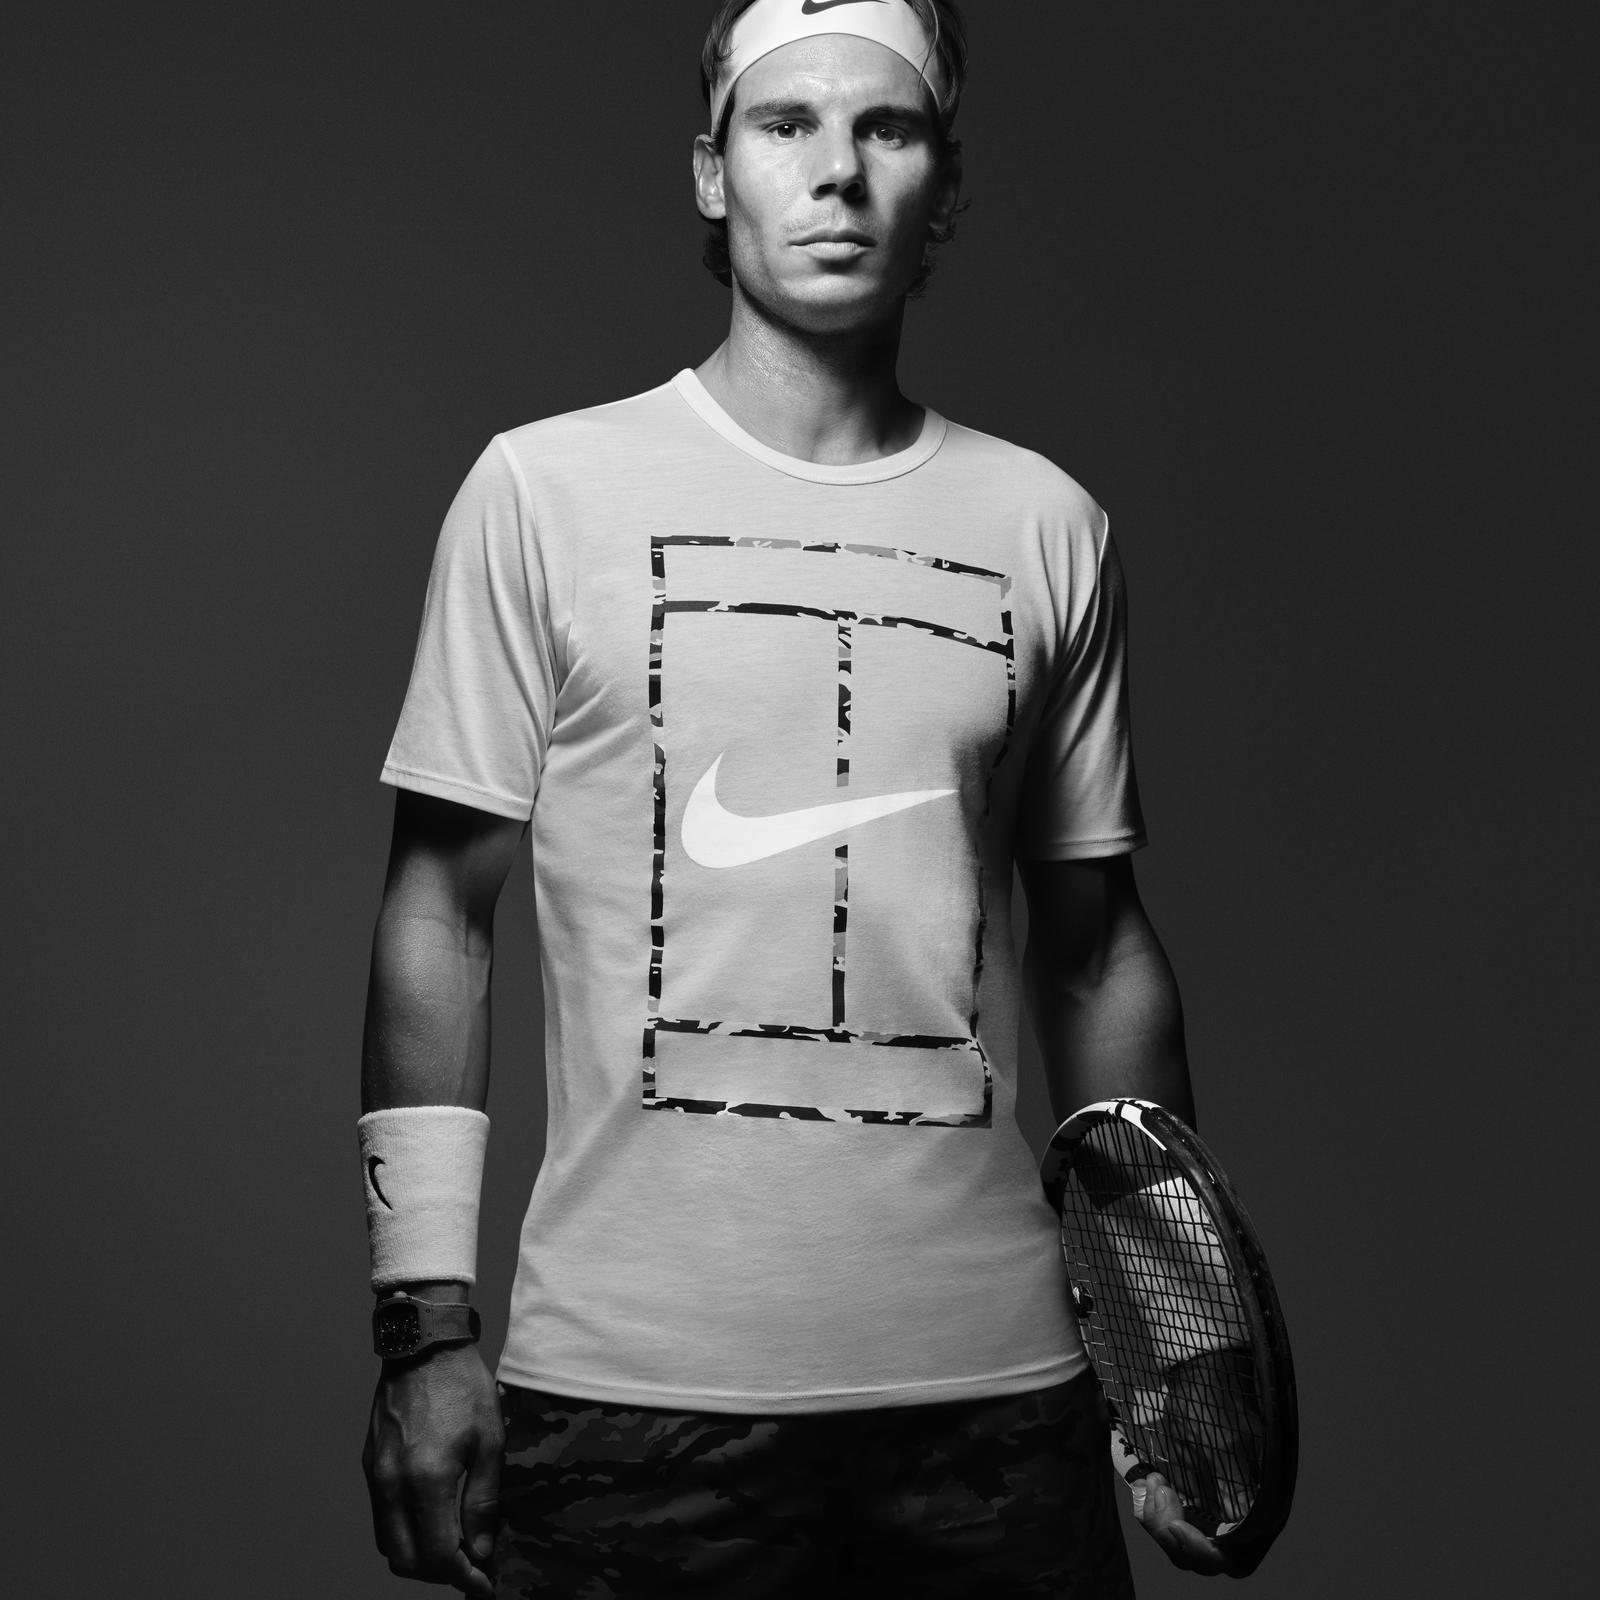 Video Rafael Nadal Stars In New Nike Advert Rafael Nadal Fans